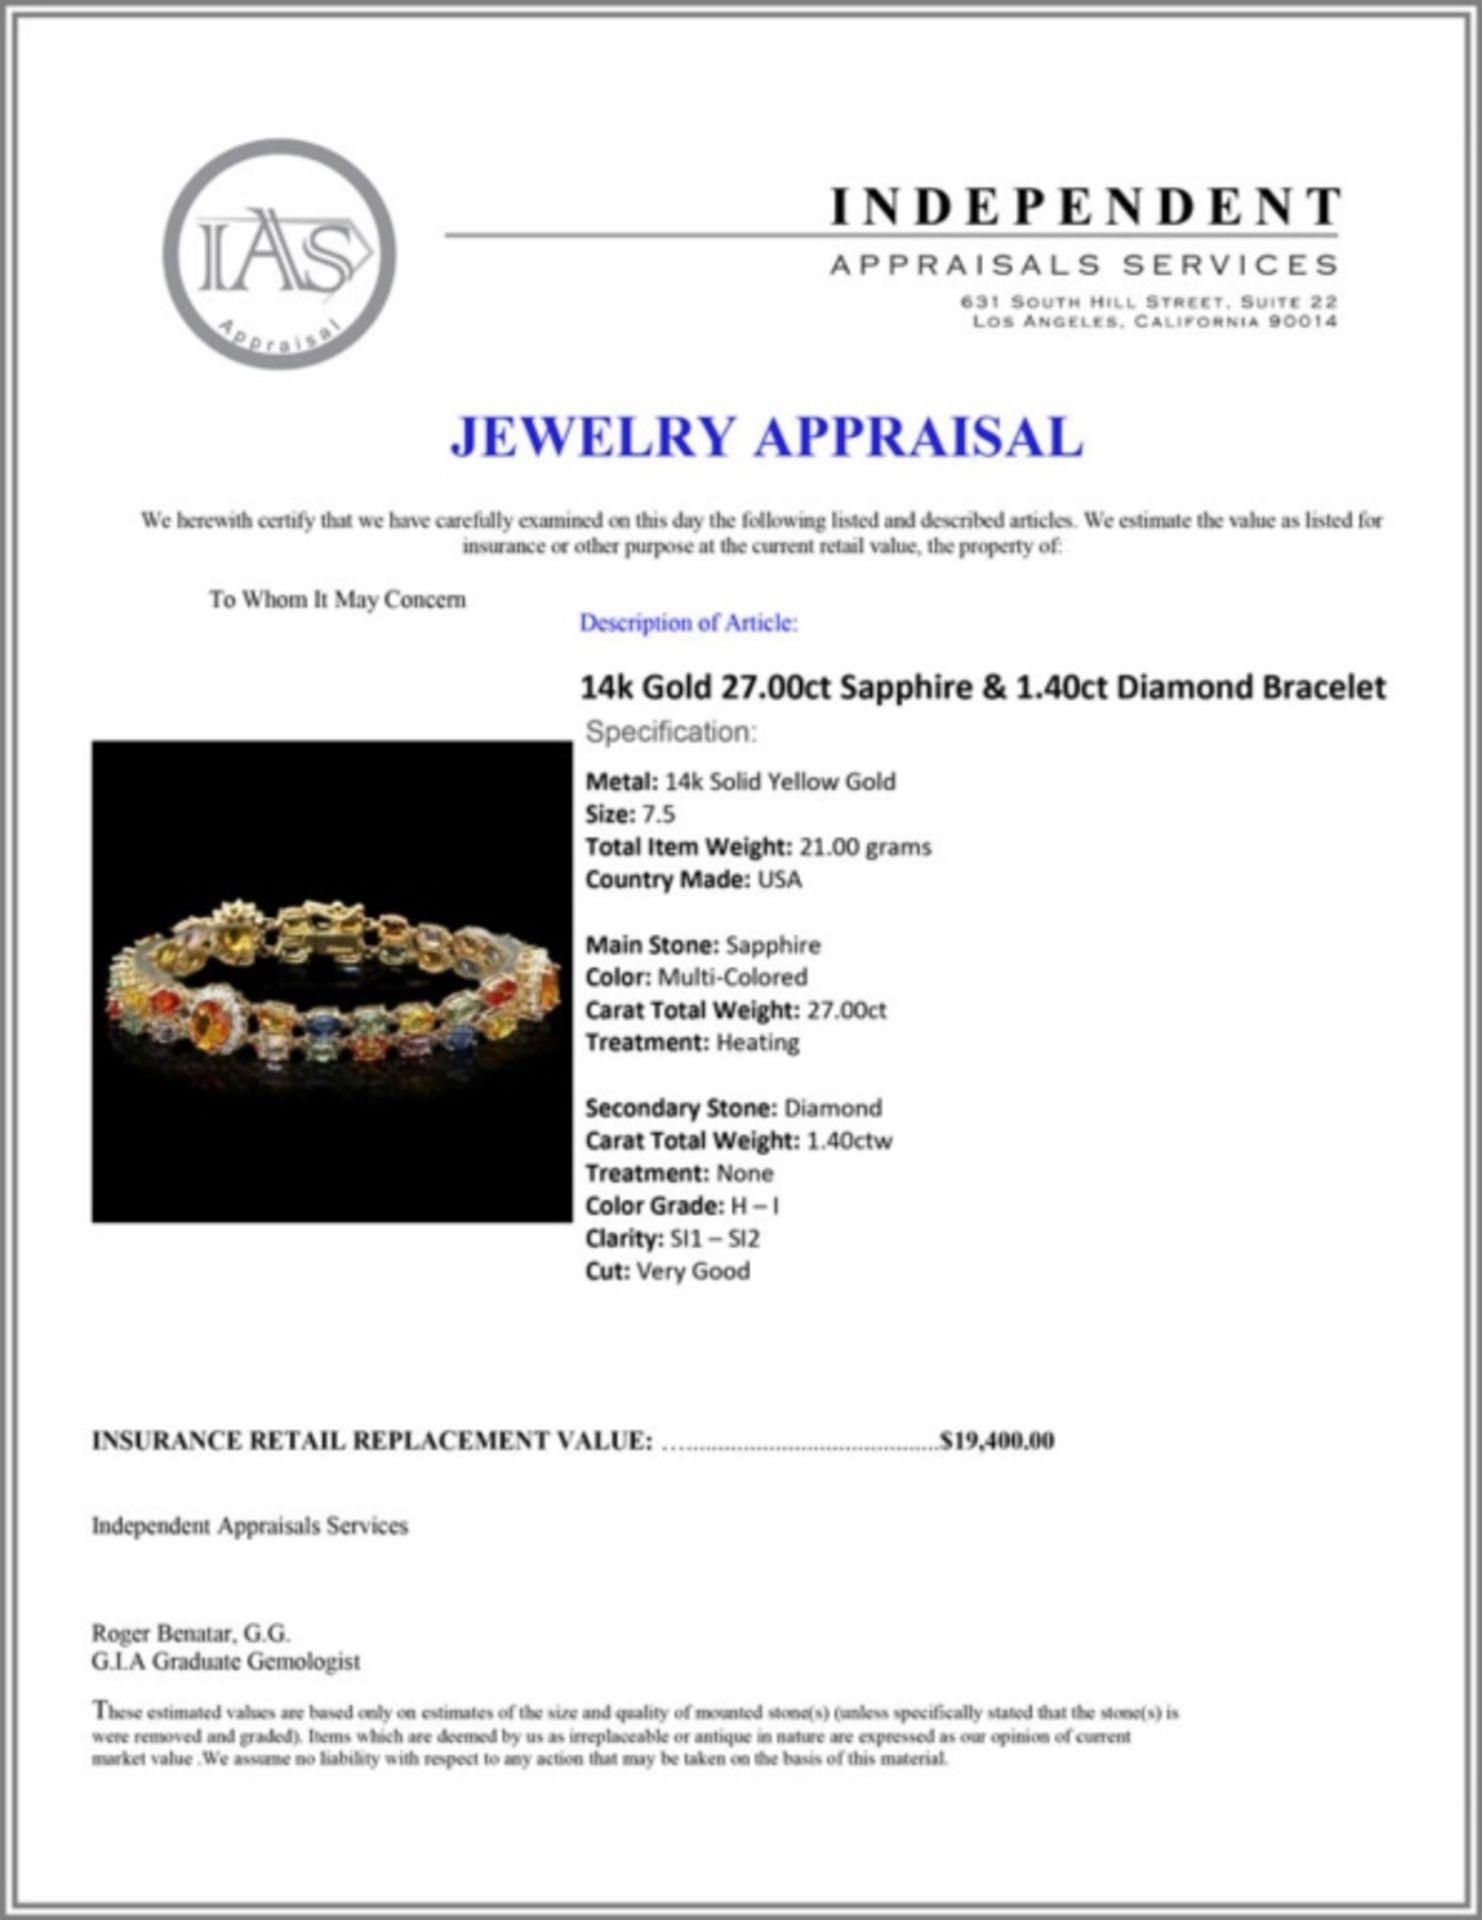 `14k Gold 27.00ct Sapphire & 1.40ct Diamond Bracel - Image 4 of 4